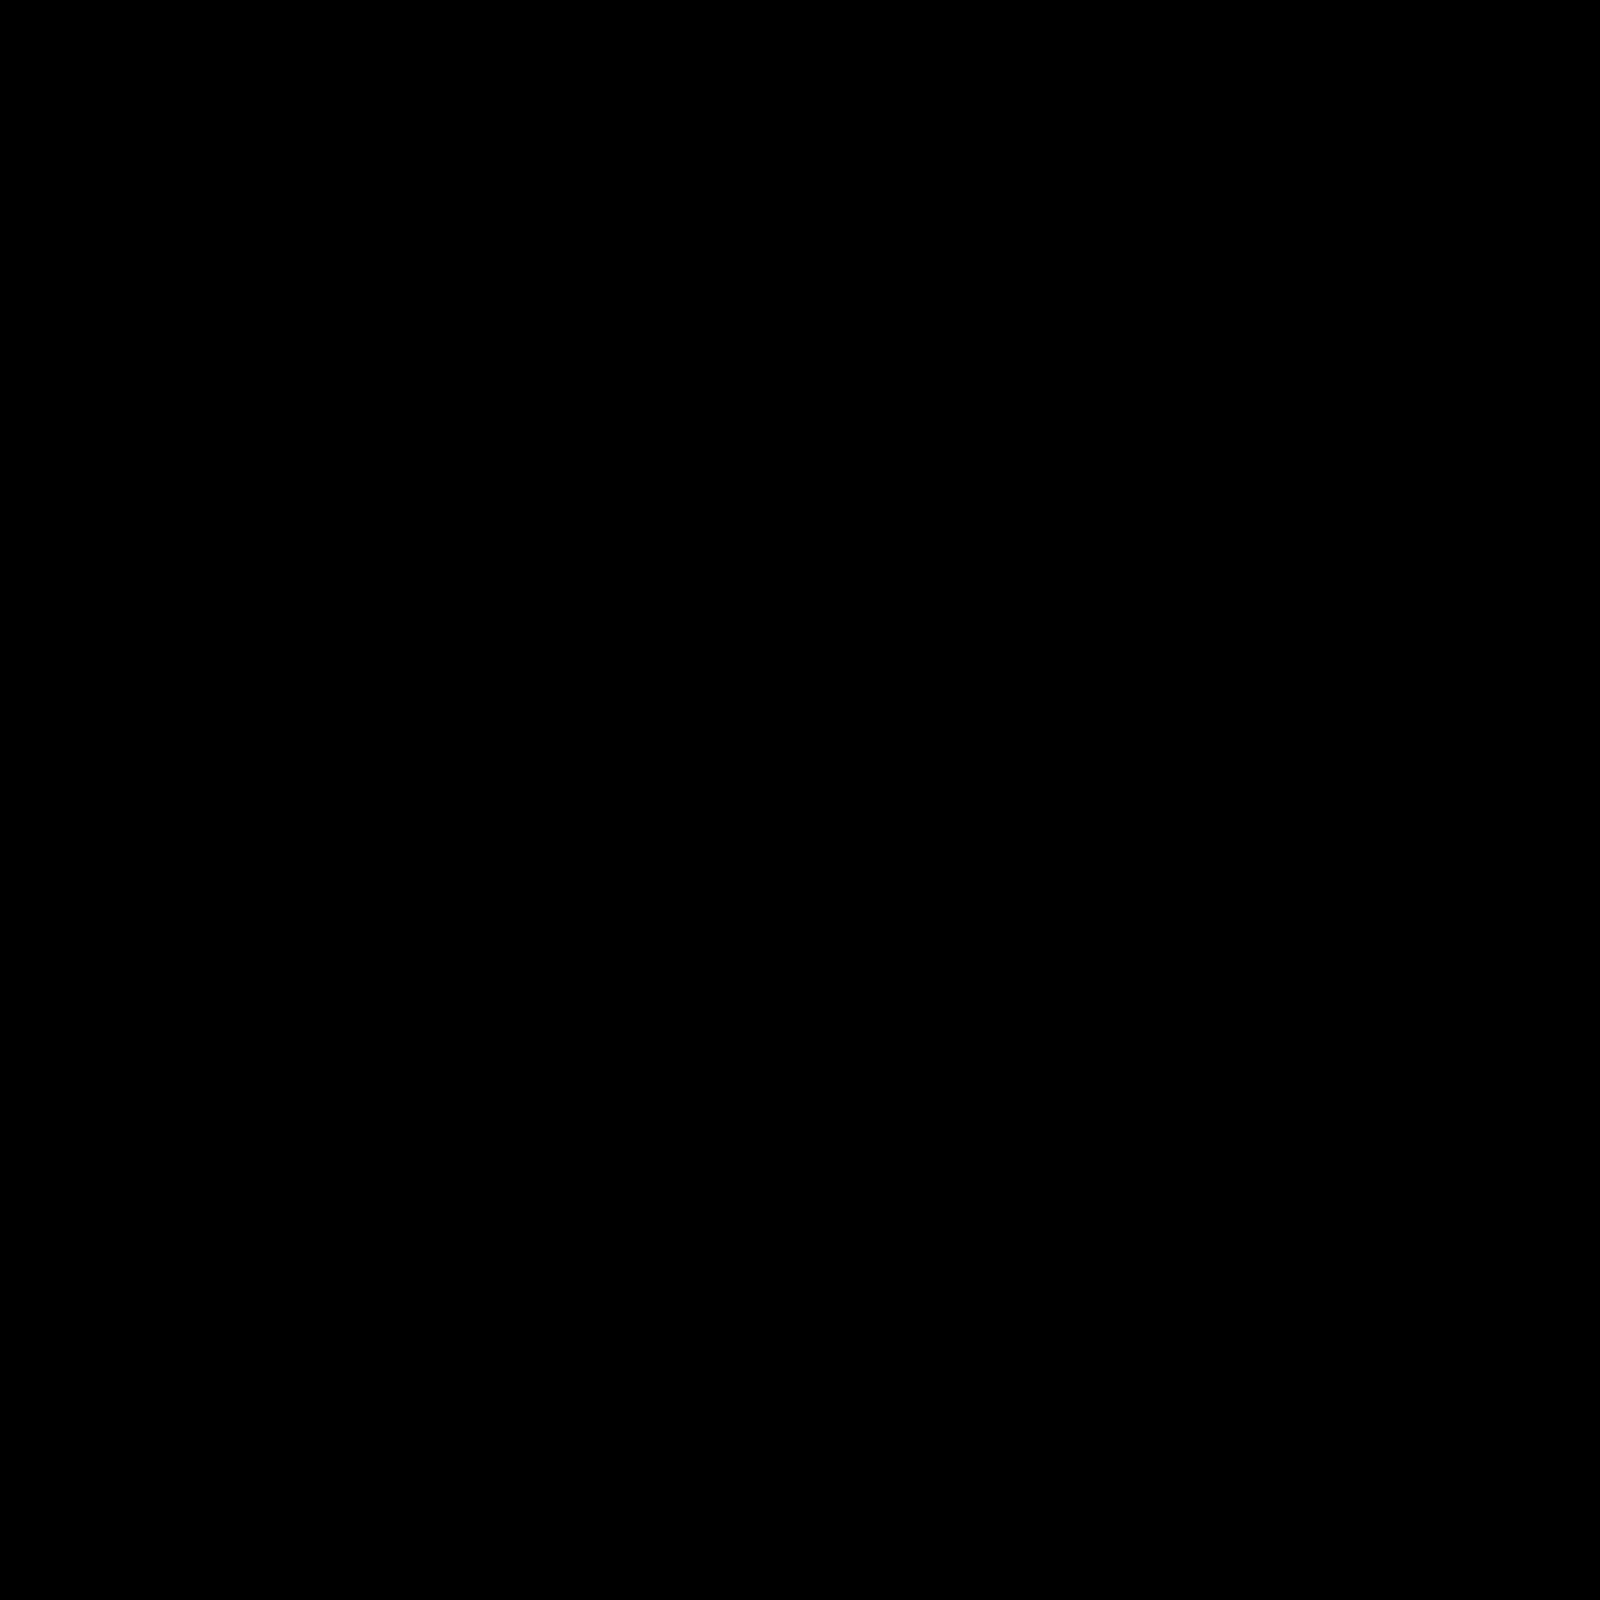 Submarino icon